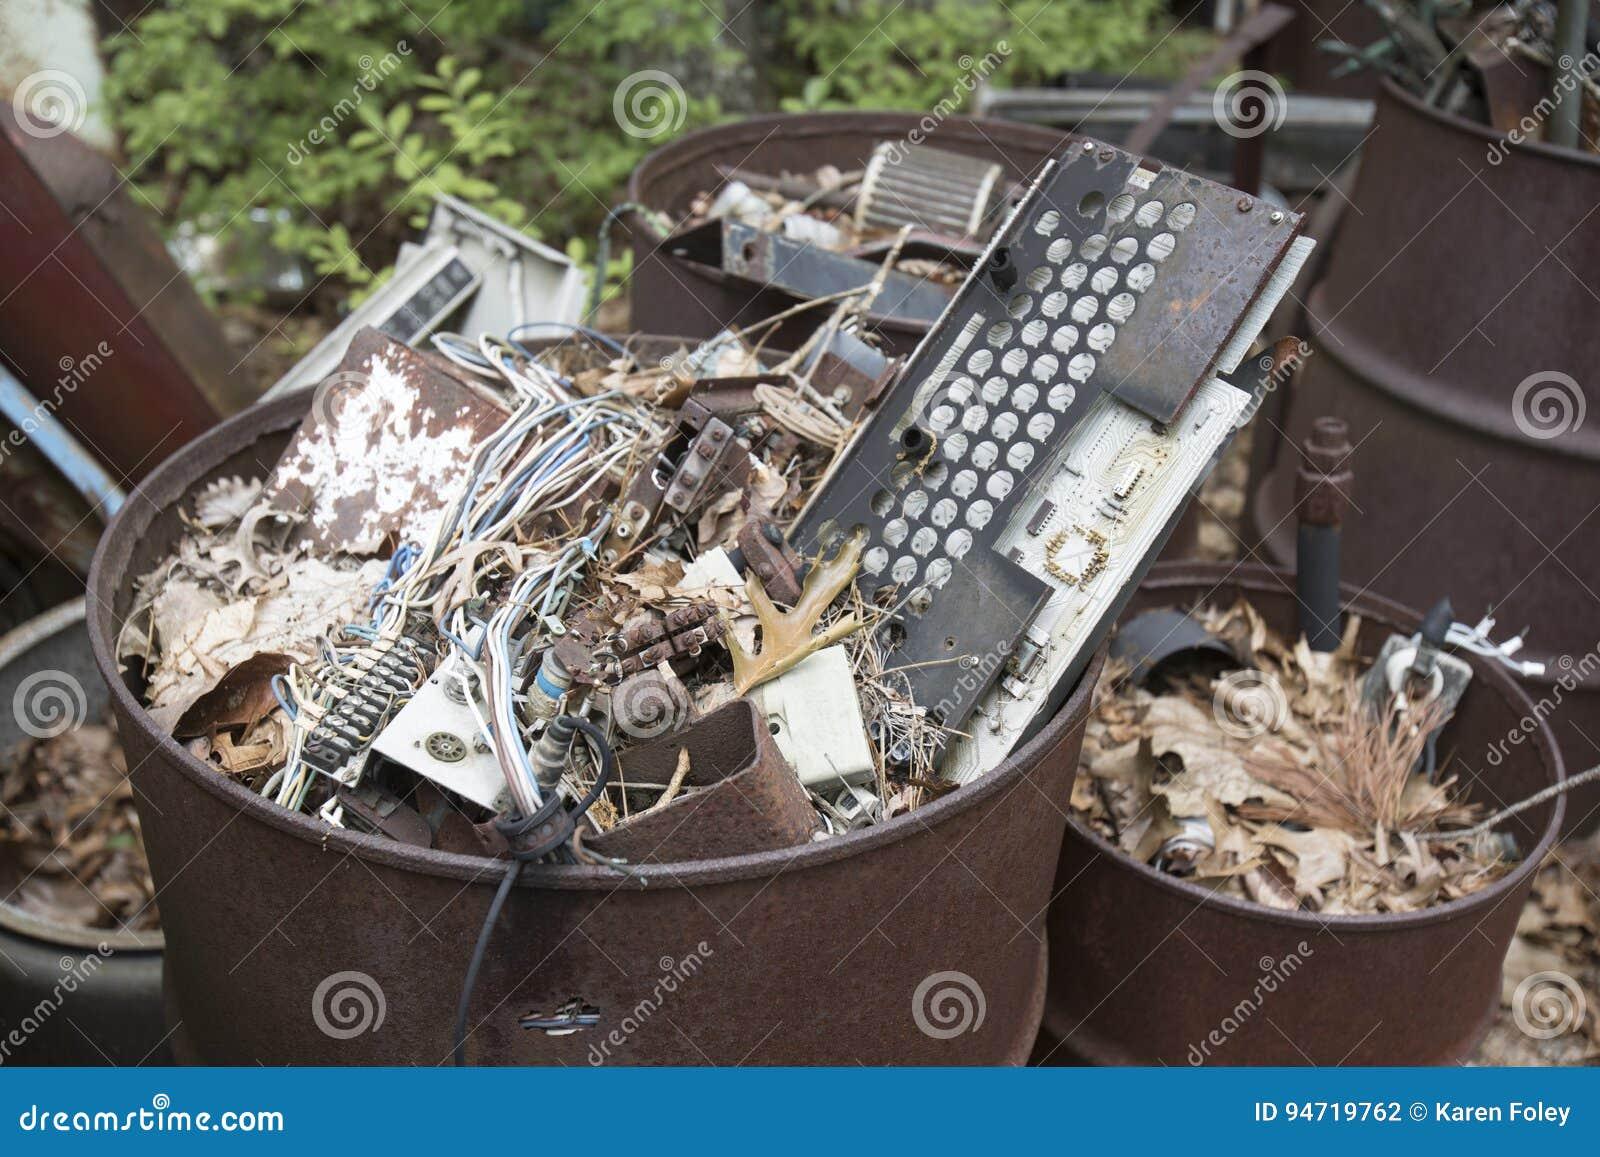 Kfz-Elektronik in den Abfalleimern